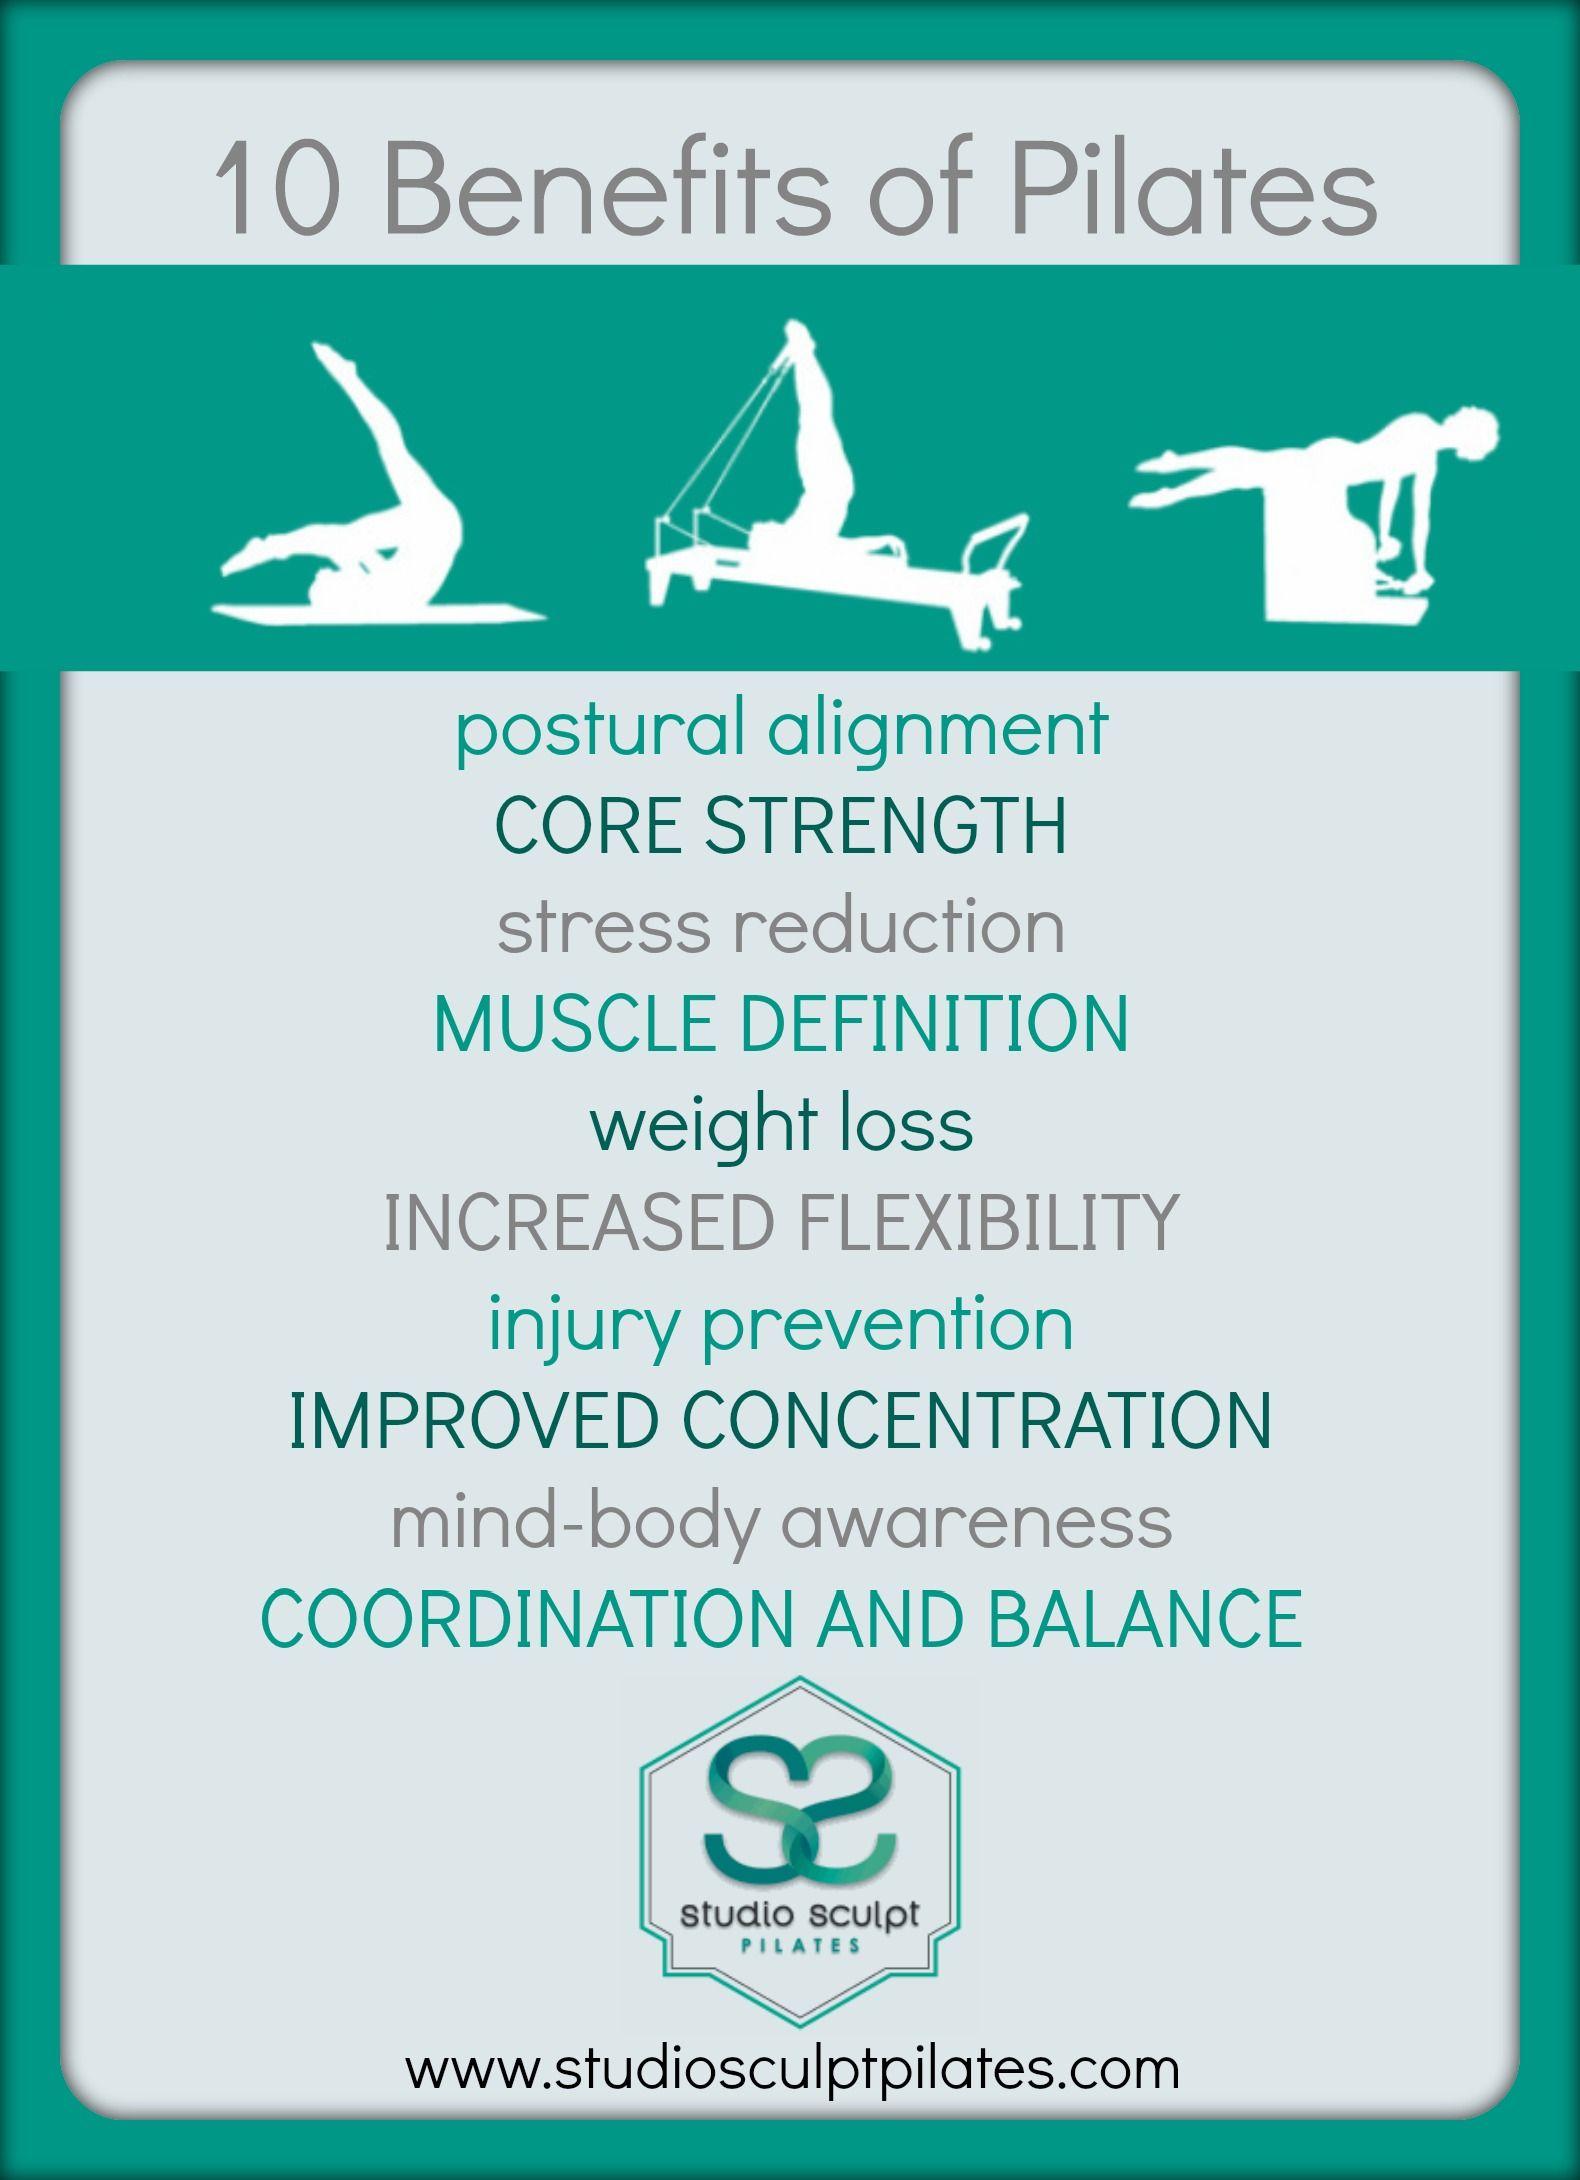 Pilates benefits videos Benefits of Pilates! #benefitsofpilates